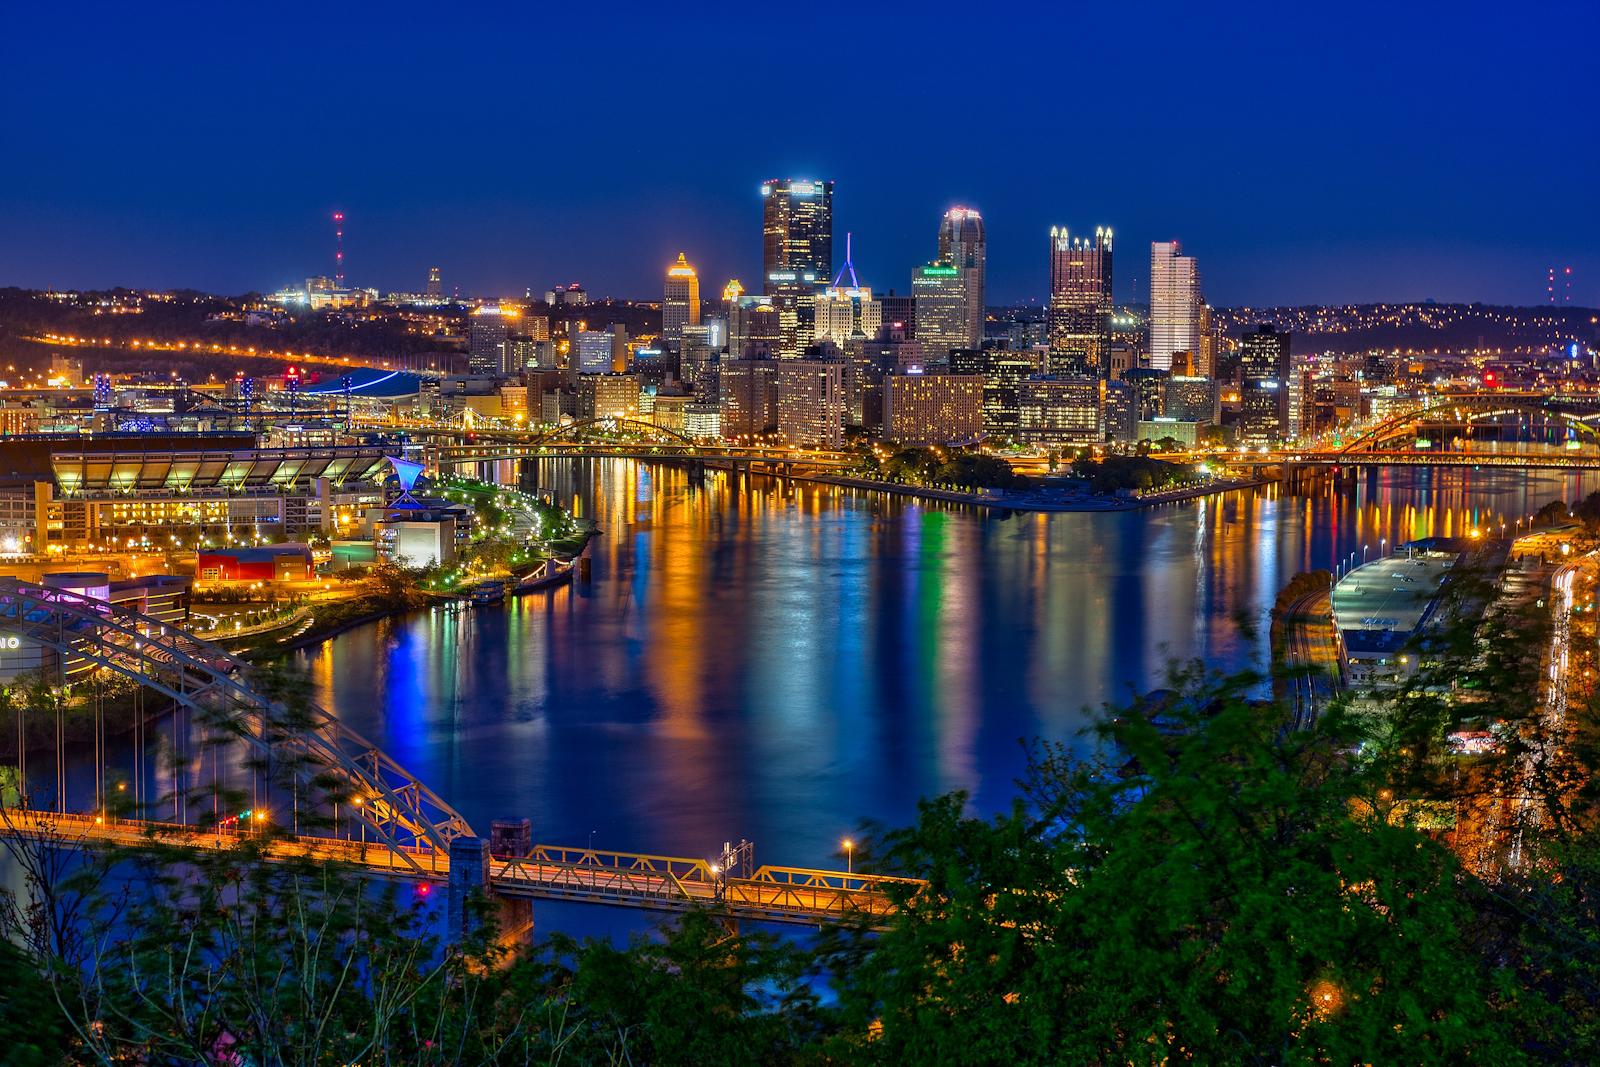 Portland Oregon Fall Had Wallpaper Pittsburgh Skyline And The Steelers Matthew Paulson